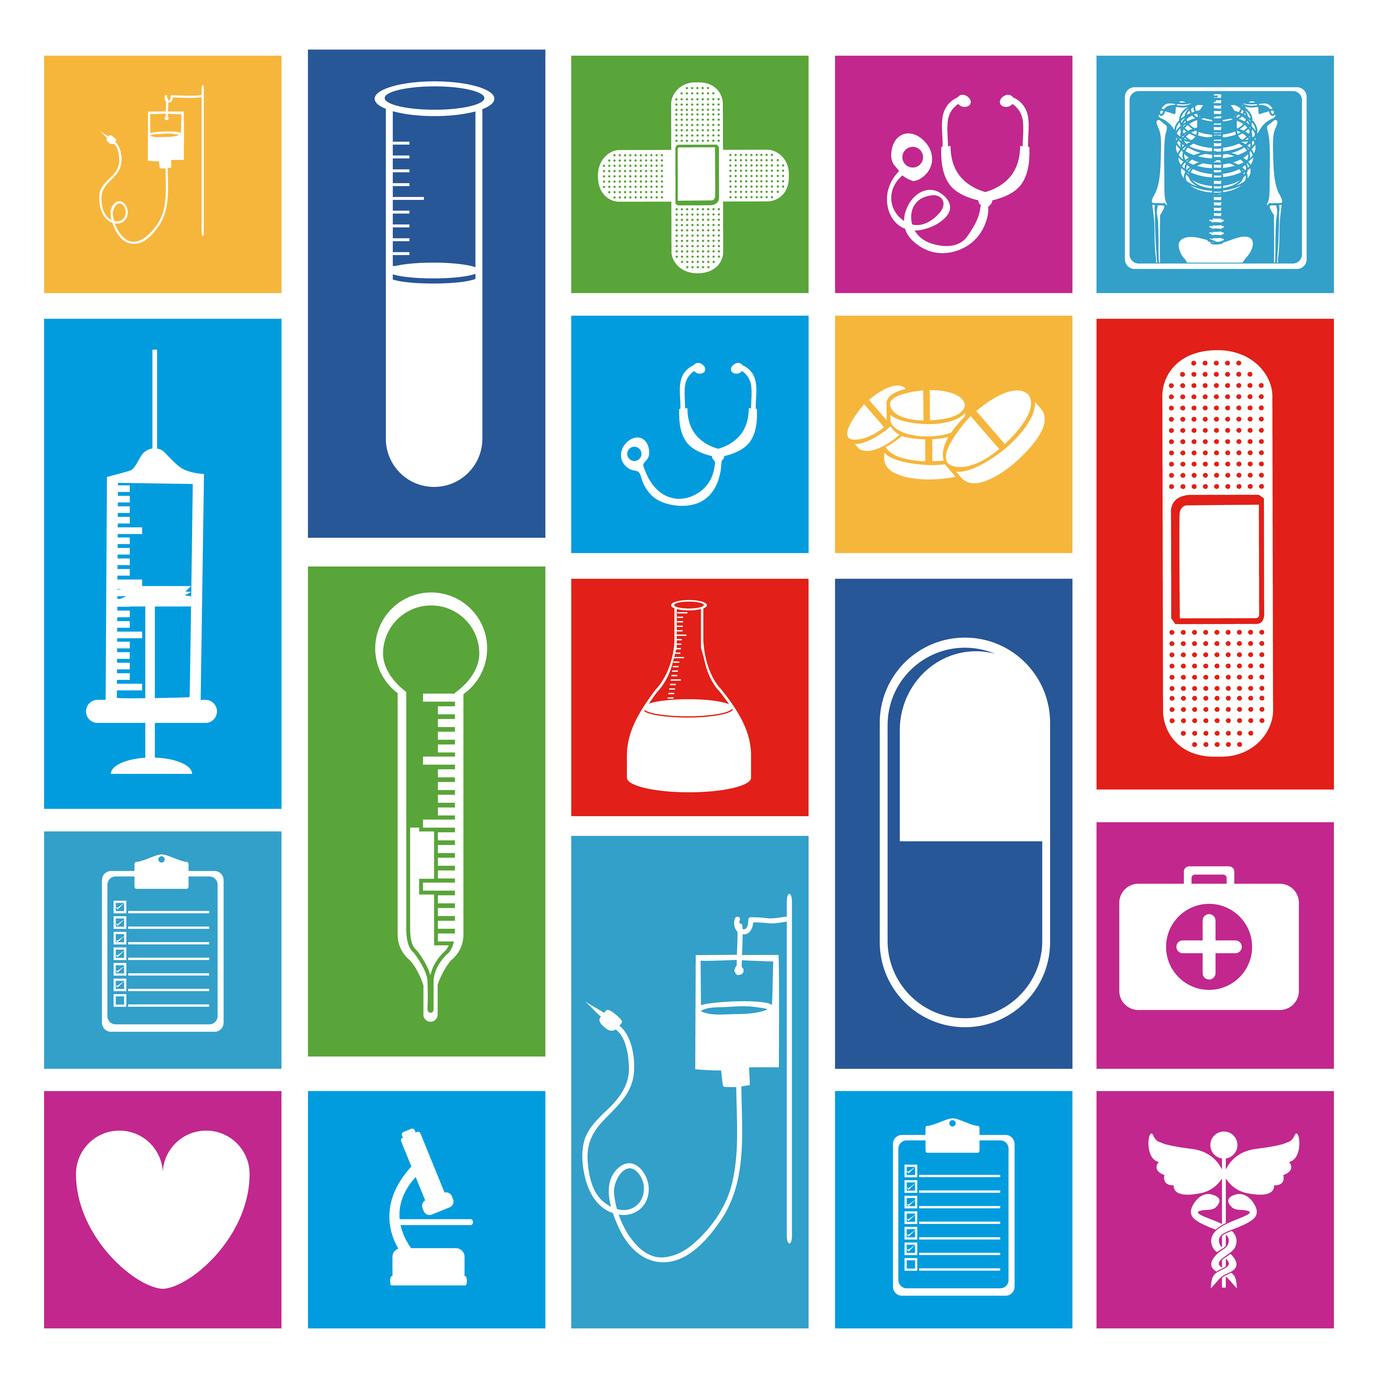 Assessment clipart nursing assessment. Videos our favorite head